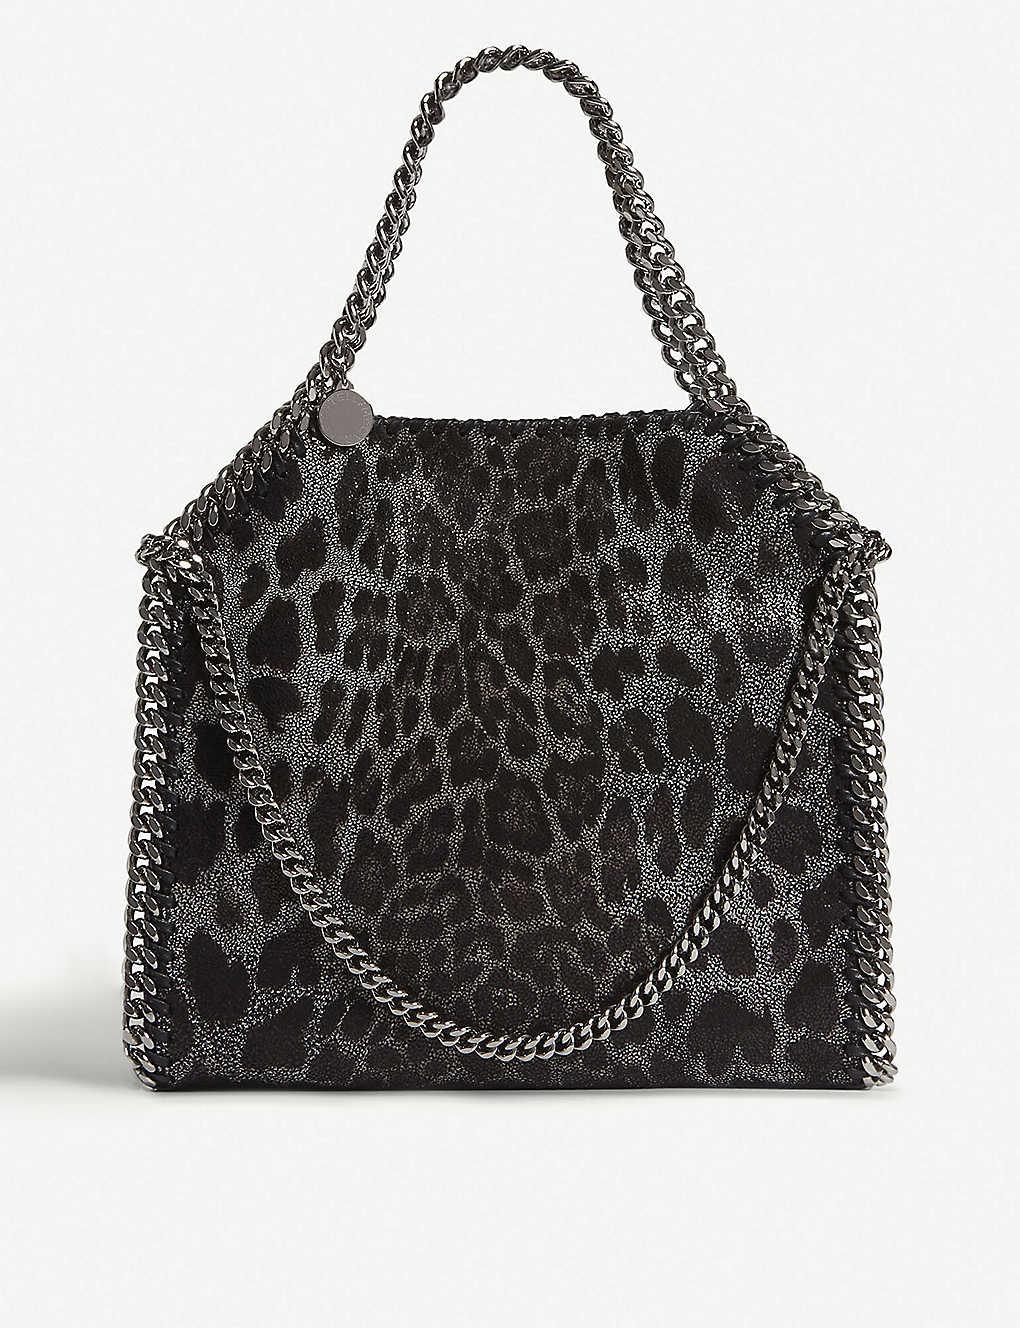 STELLA MCCARTNEY - Falabella Baby Bella faux-suede shoulder bag ... c0285b7f36589